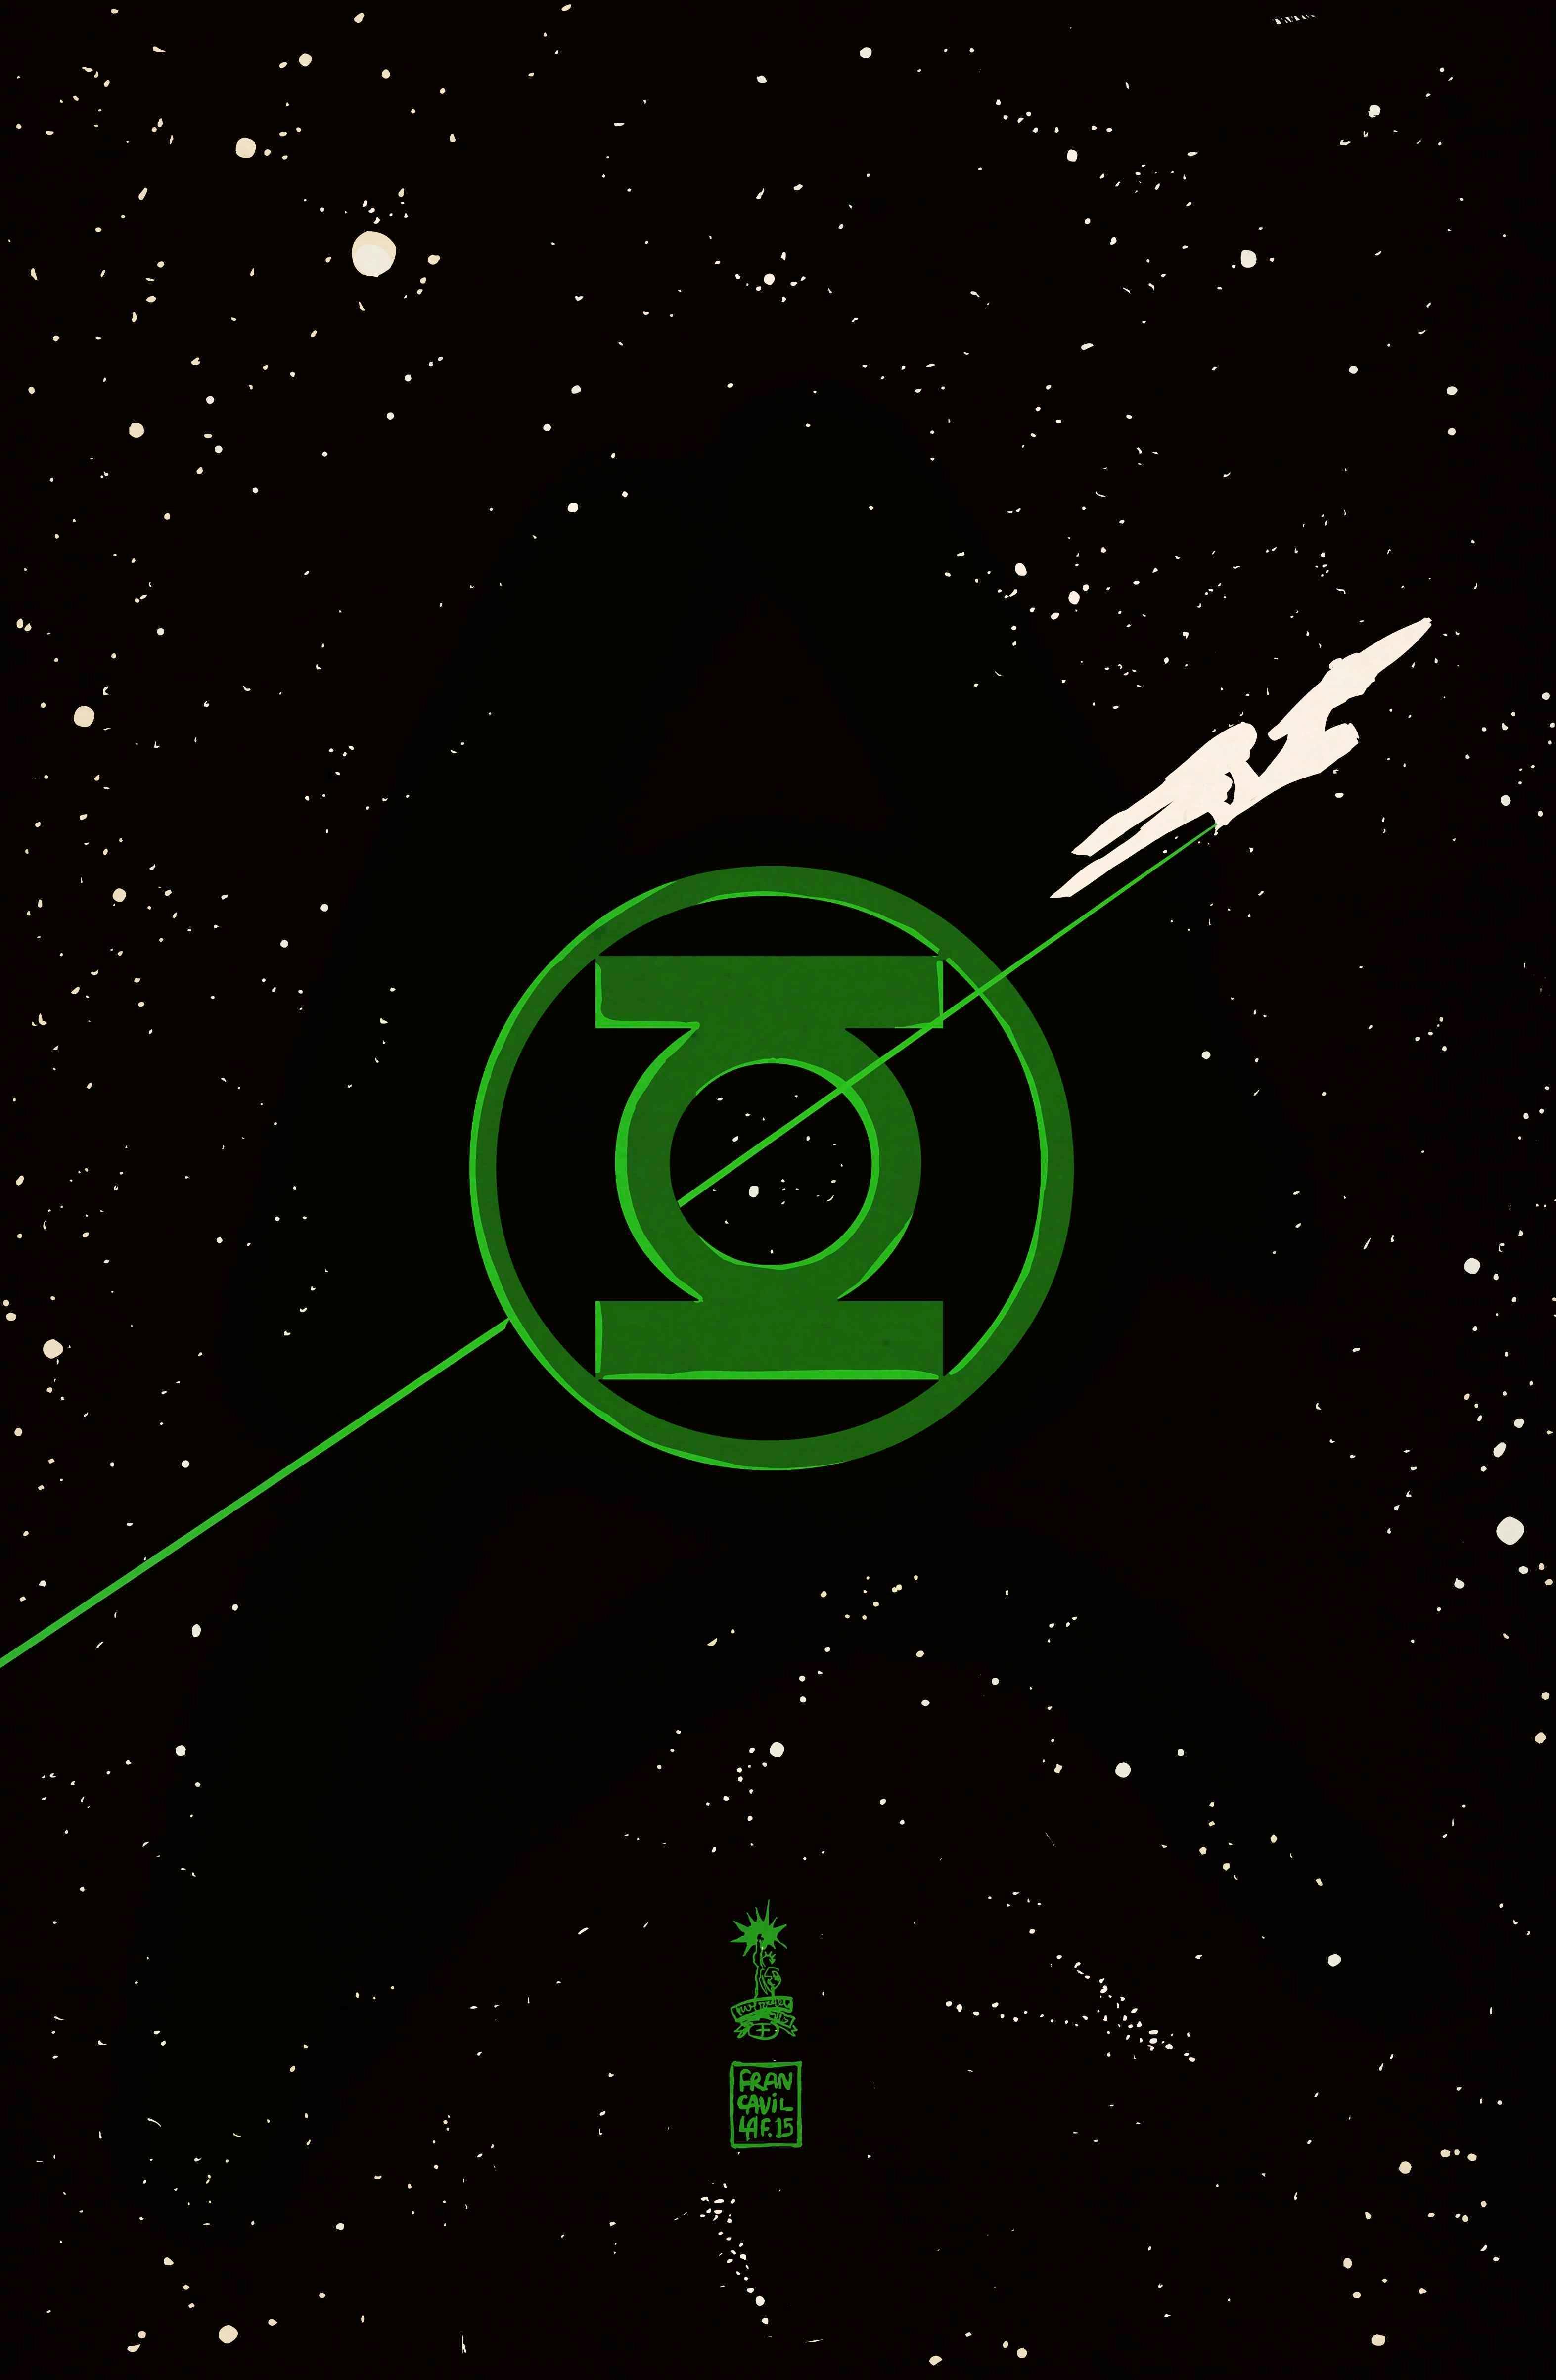 Captain Kirk's crew to encounter Green Lantern Hal Jordan in